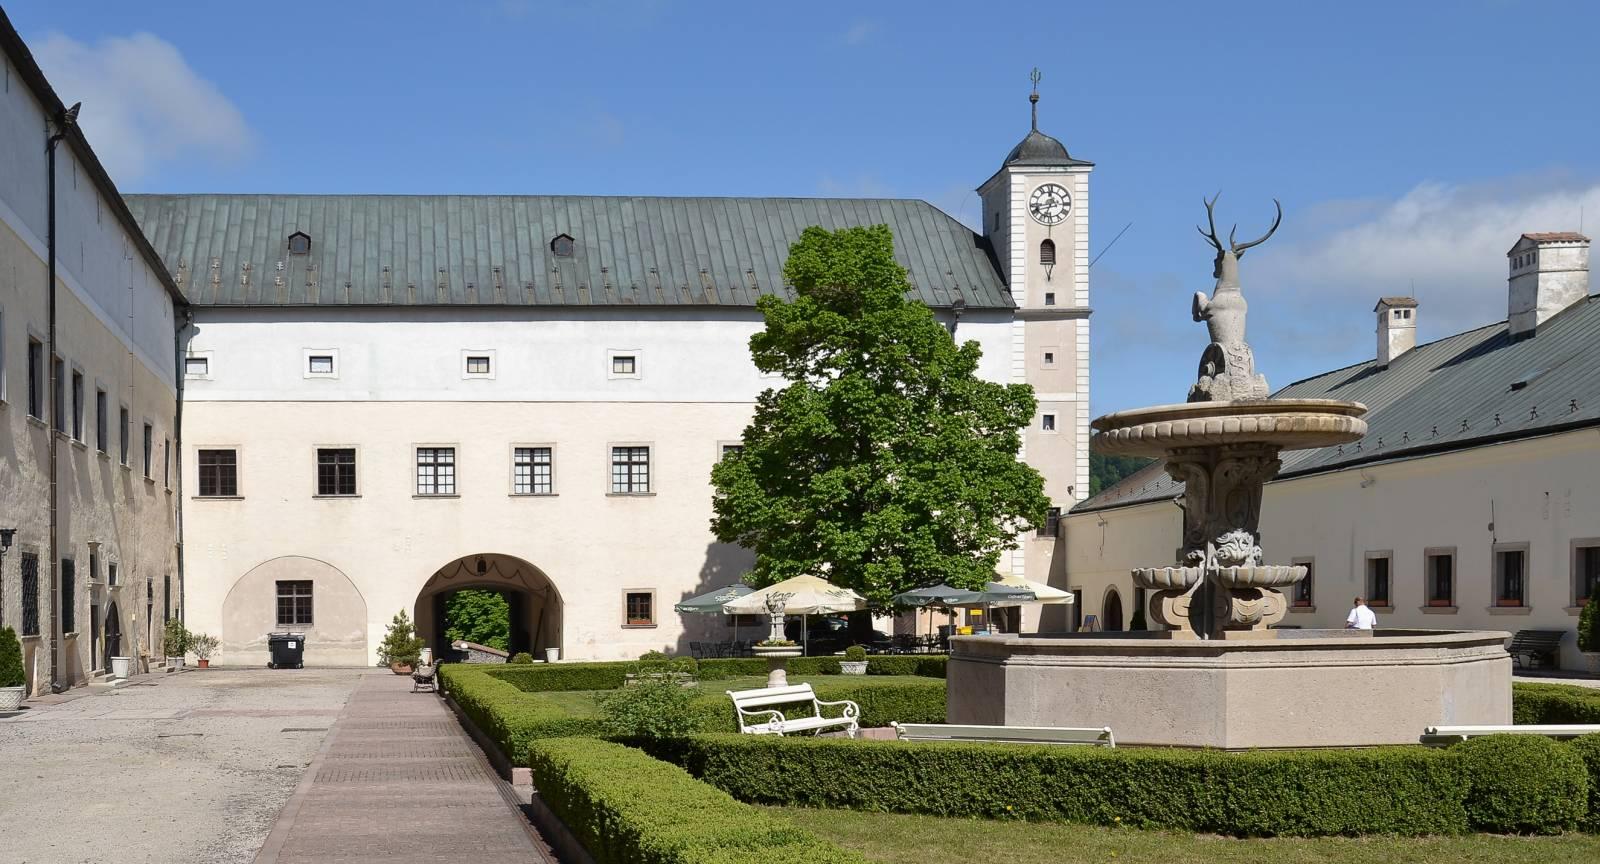 Červený_Kameň_(Bibersburg,_Vöröskő)_-_courtyard-1